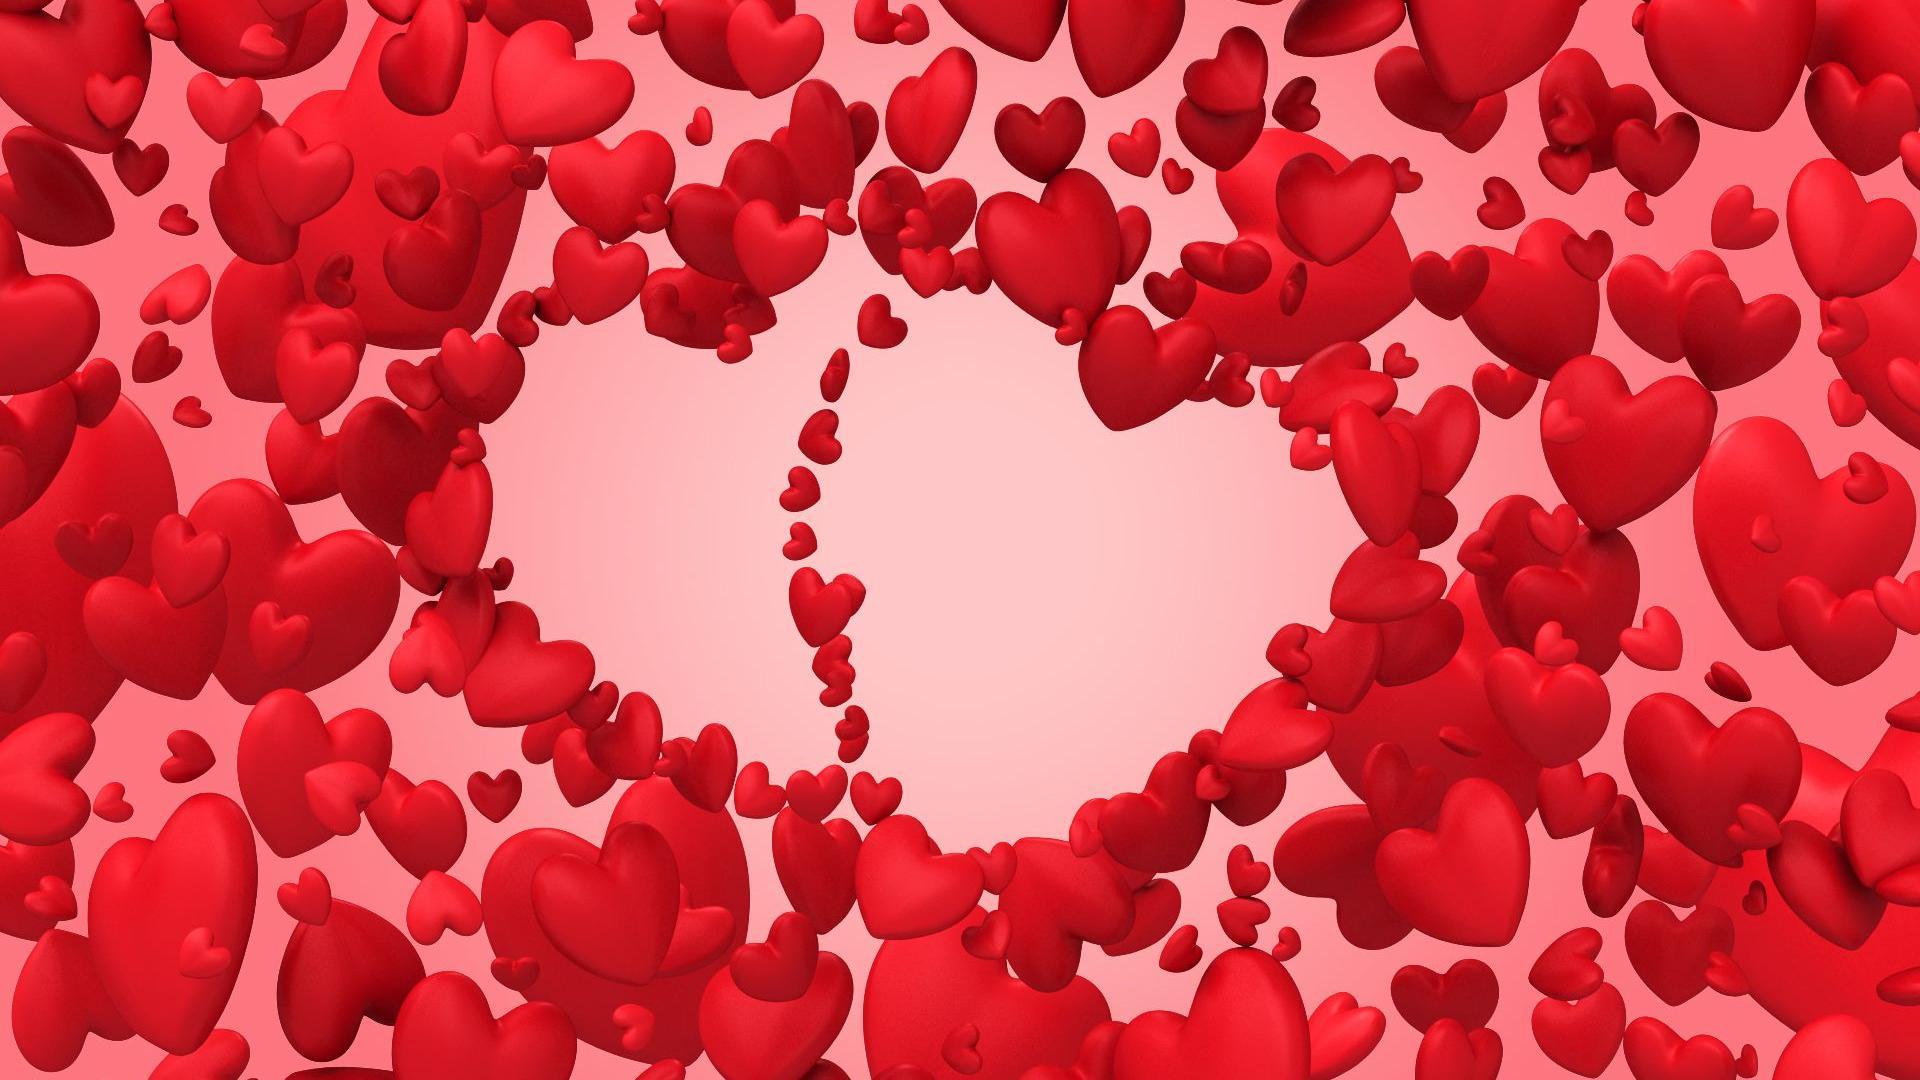 Download Cool Little Hearts Love Hd Wallpaper Full HD Wallpapers 1920x1080